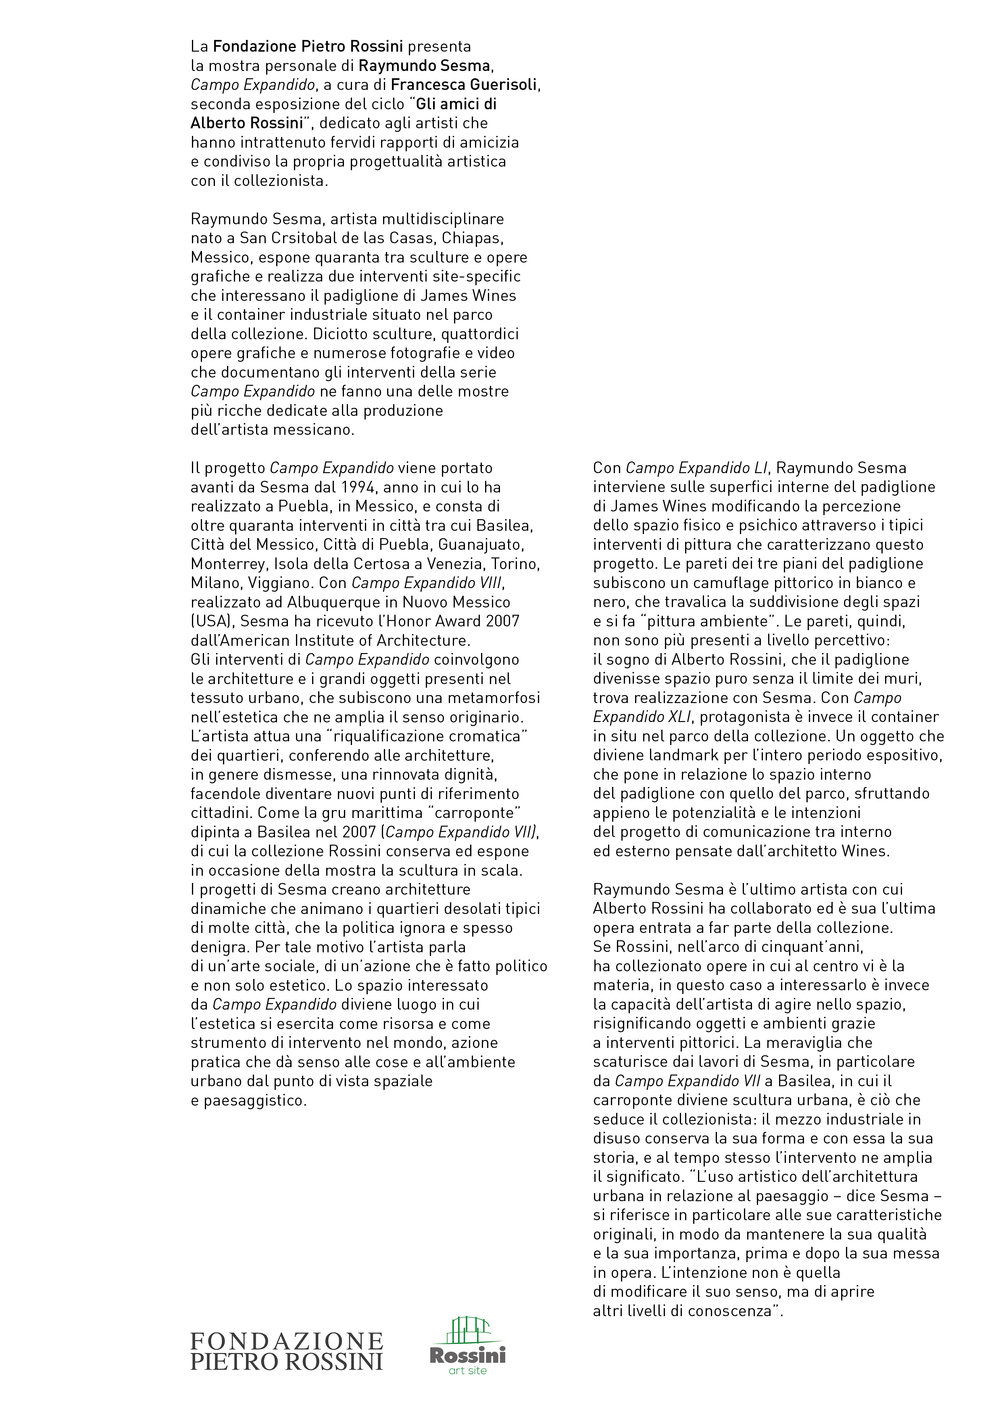 RaymundoSesma_CS_A4_Ita_Web_ok32.jpg